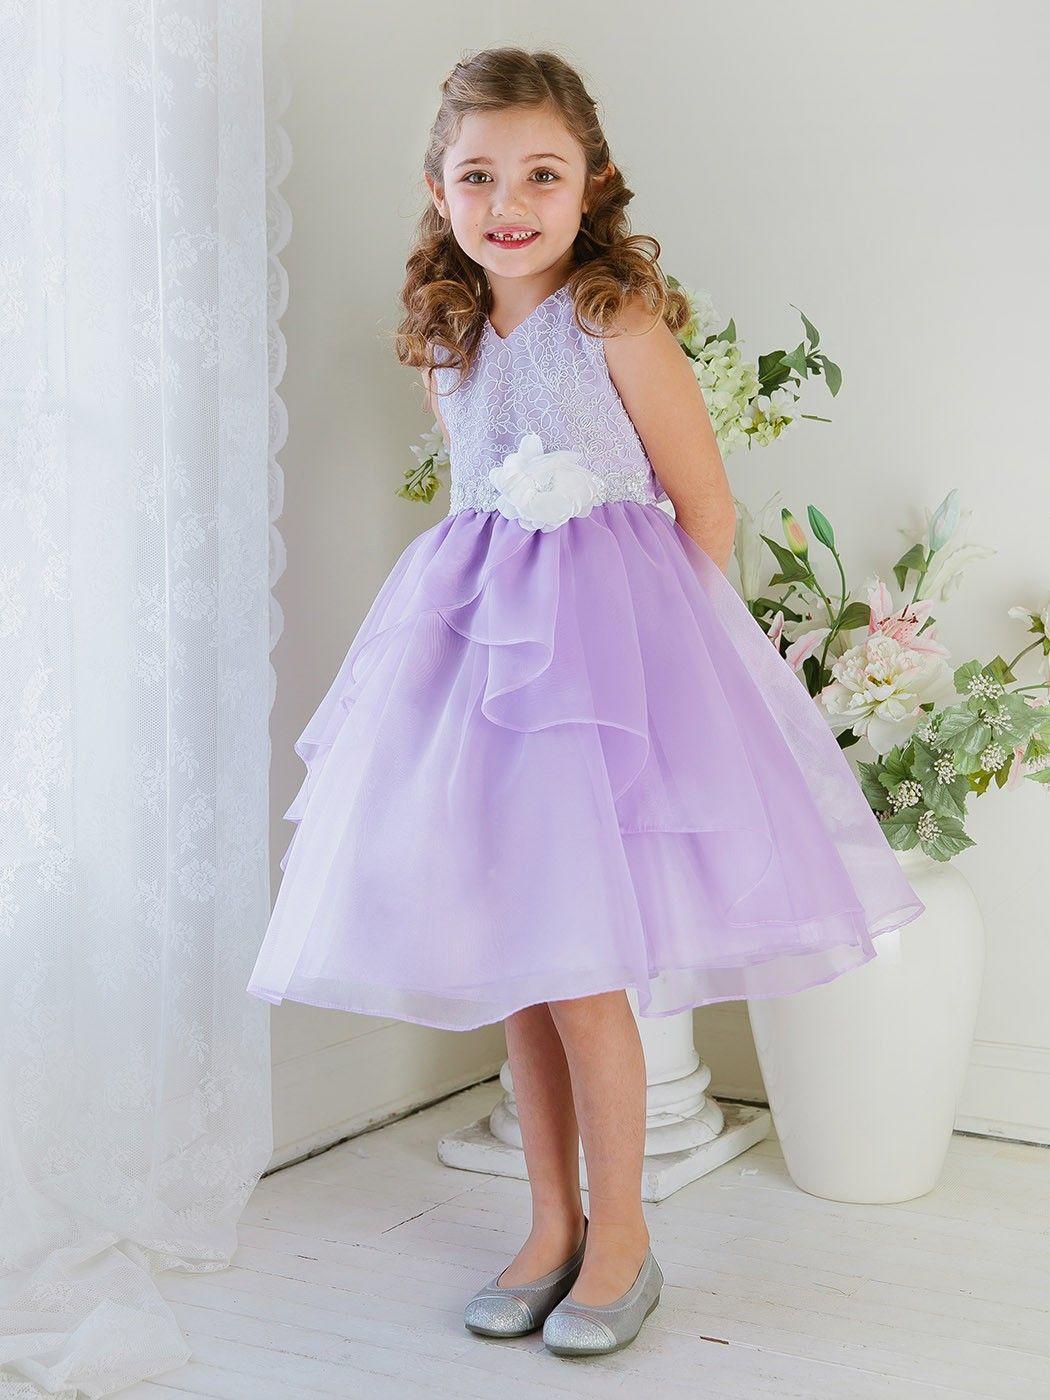 2306cf80c72 White Lilac Beautiful Sleeveless Lace and Ruffled Organza Skirt Flower Girl  Dresses SKU   KC1241LC